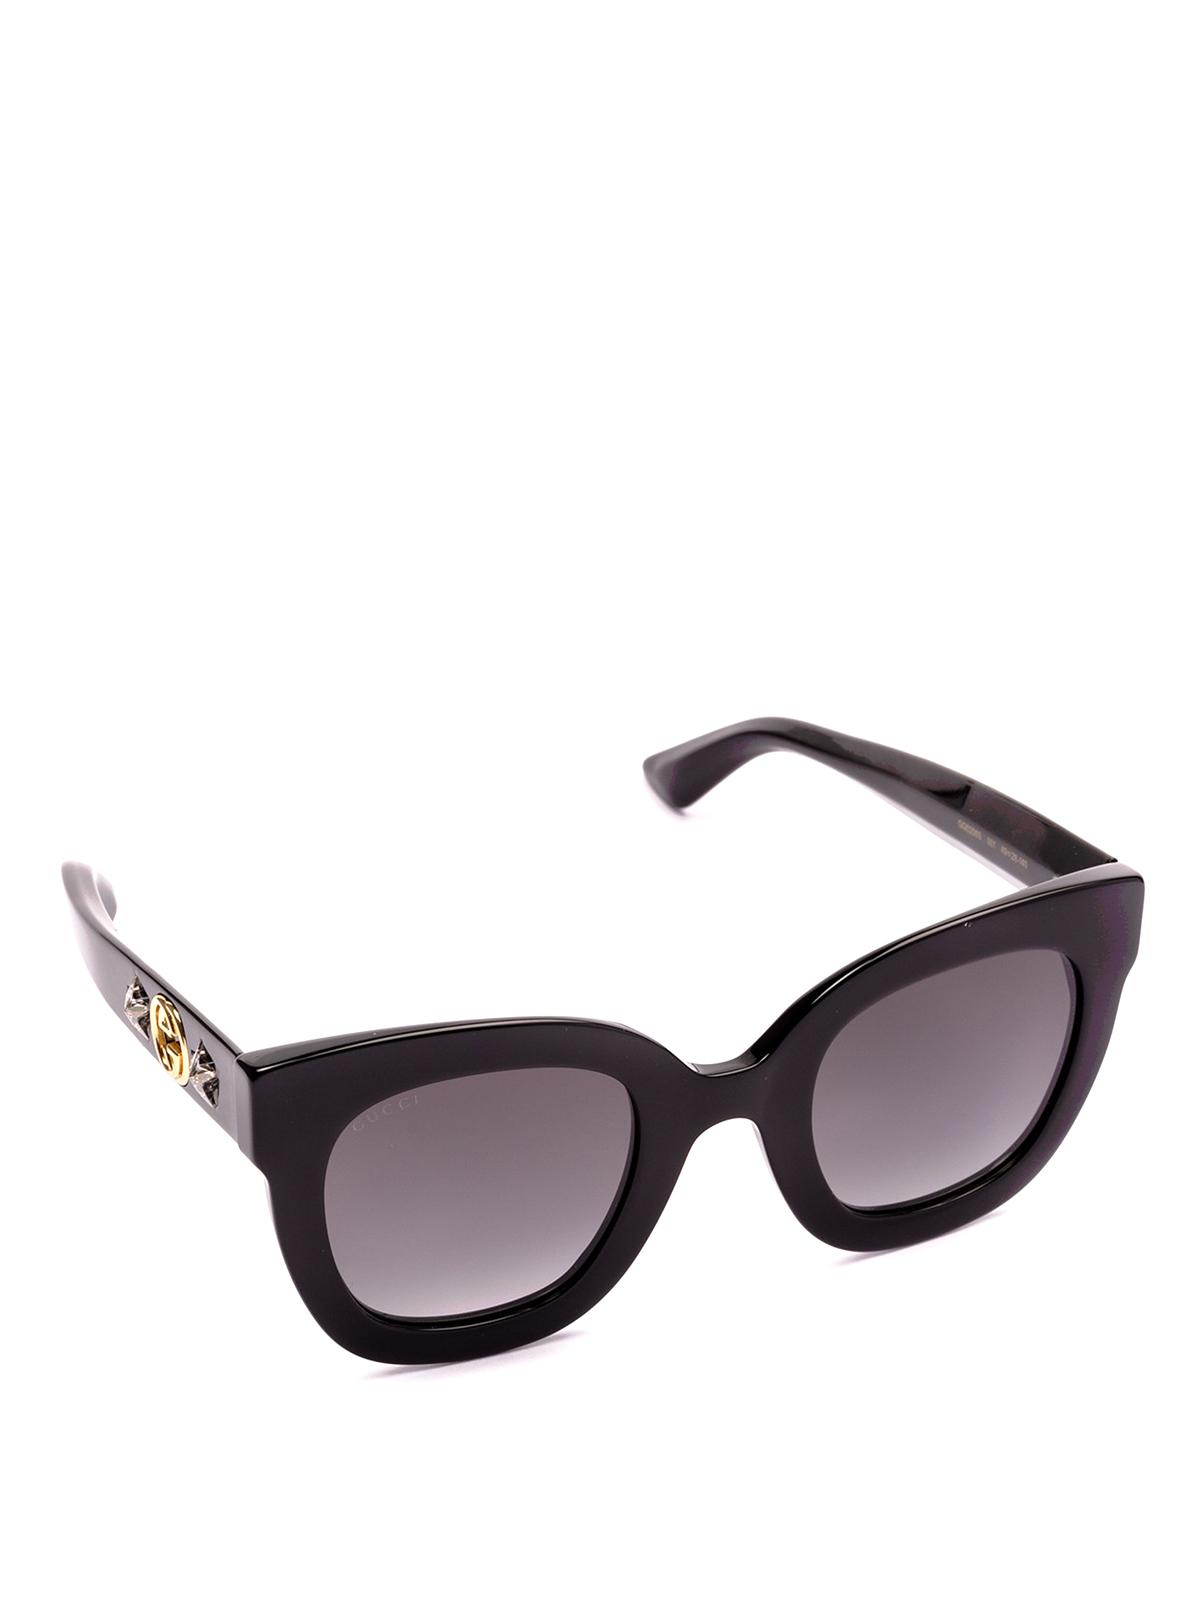 420b62c7e94 Gucci - Acetate sunglasses with logo and stars - sunglasses ...